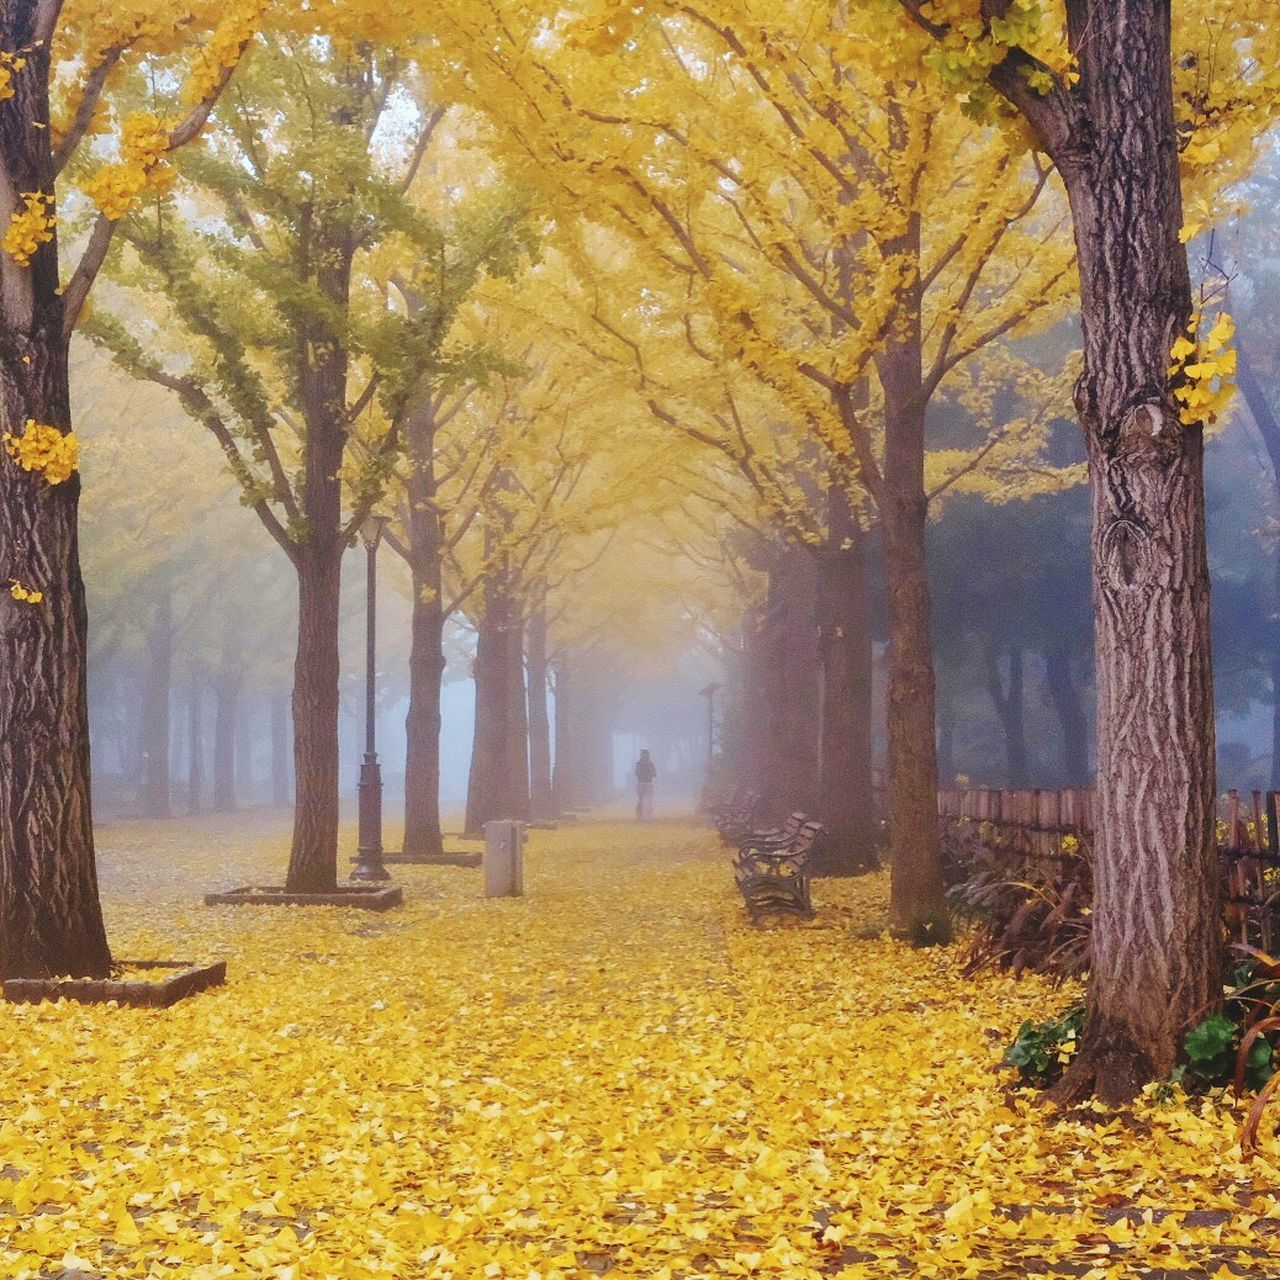 Tree Autumn Nature Forest Beauty In Nature Japan EyeEm Gallery EyeEm Best Edits EyeEm Best Shots Fujifilm Eyemphotography Beautiful Nature X-PRO2 Wabi-sabi Japan Photography Fujifilm_xseries Beauty In Nature Street Photography Yellow